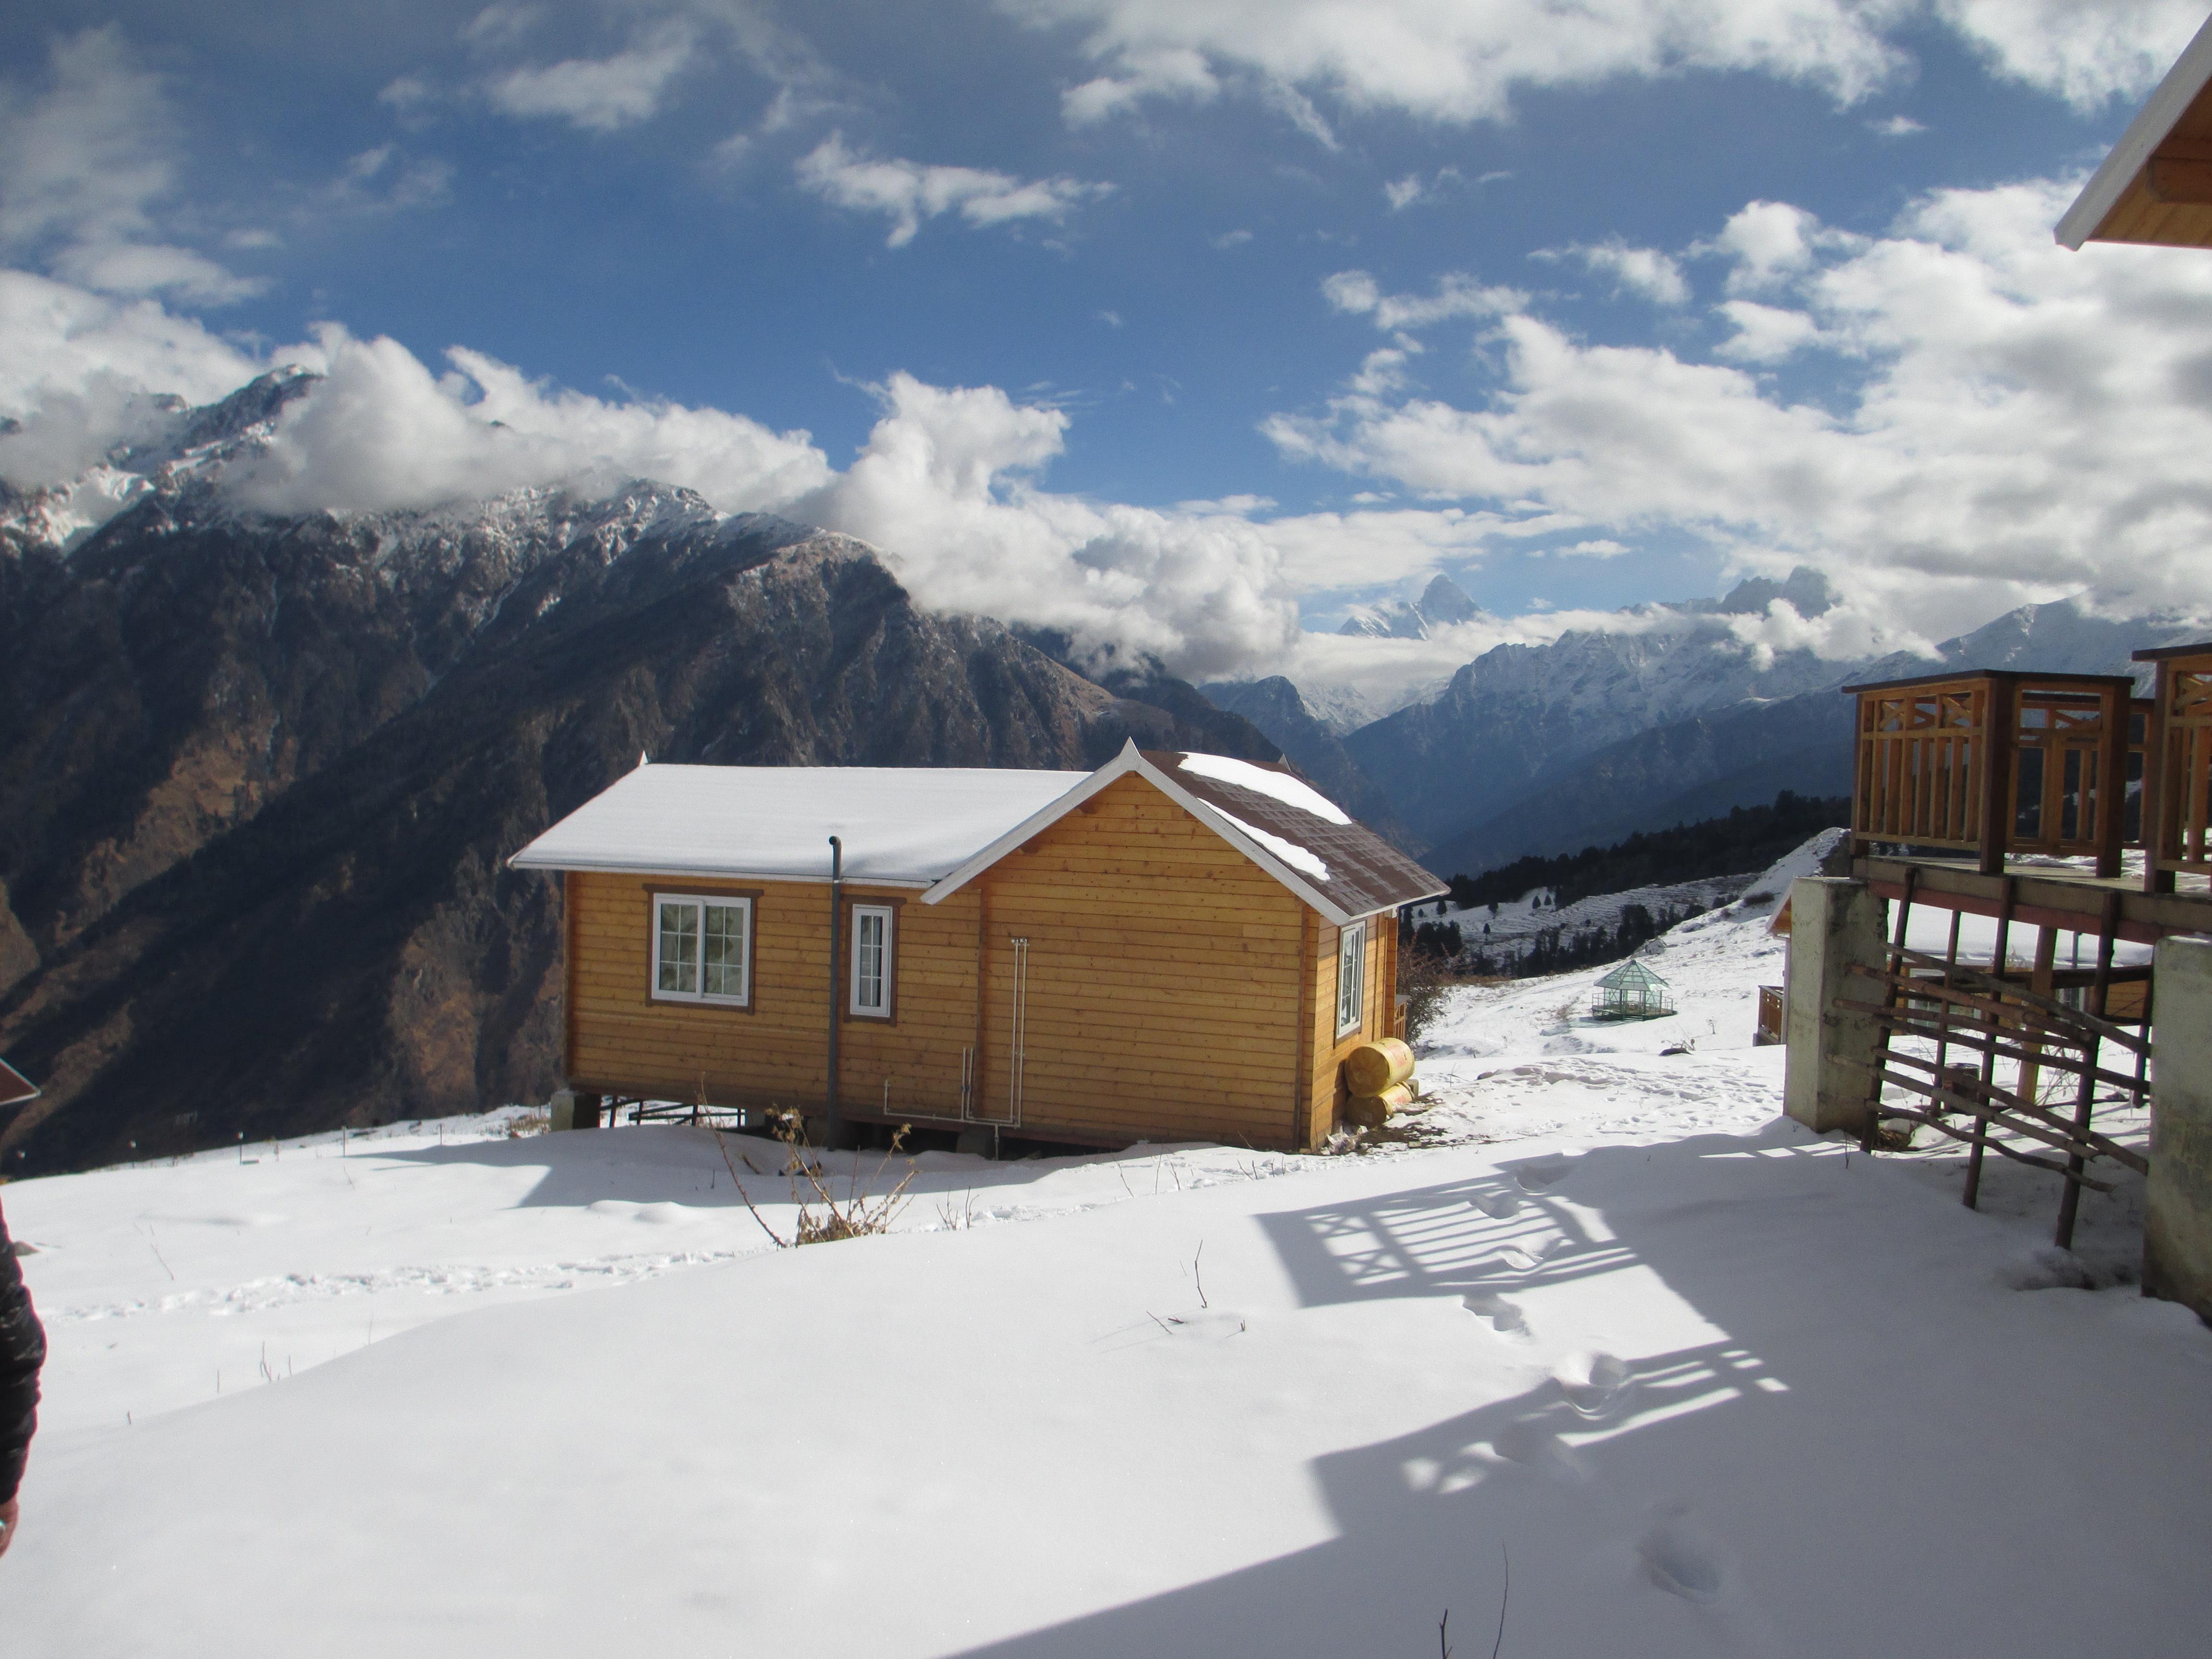 nanda devi view resort, Auli